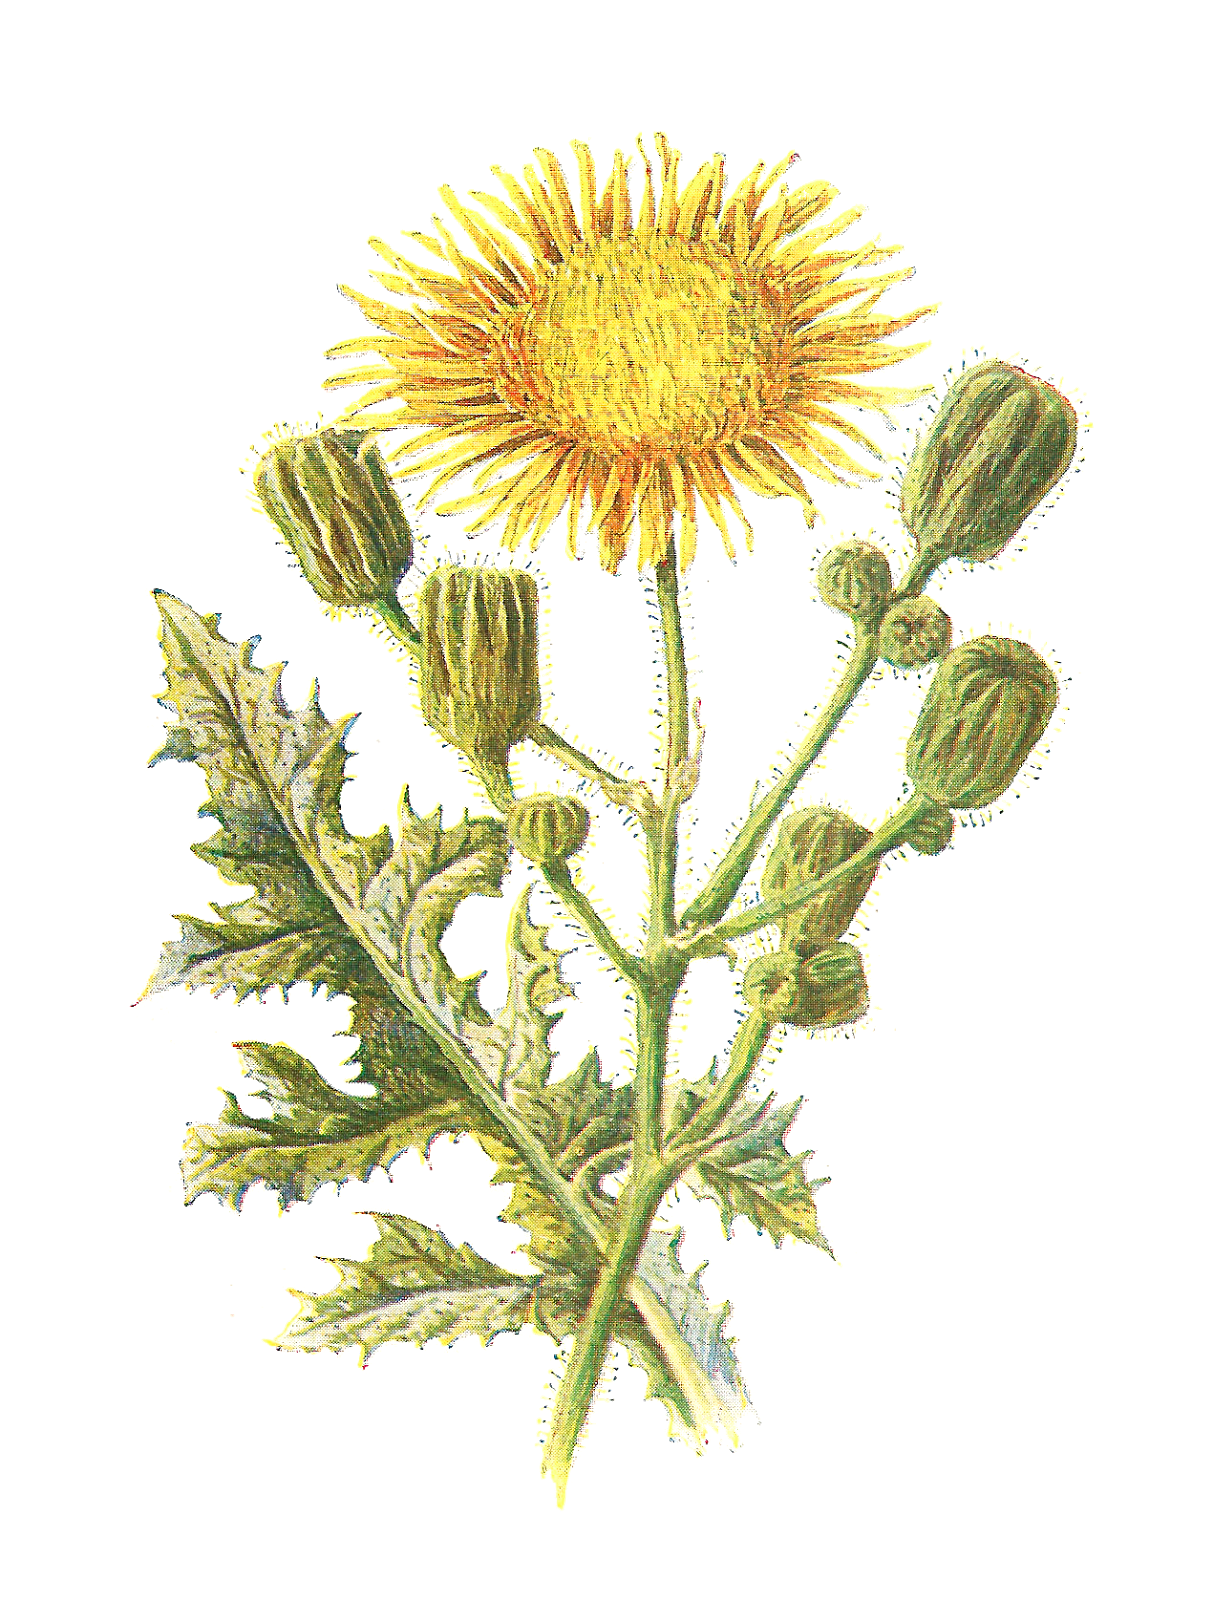 Antique Images Vintage Scrapbooking Wildflower Download Printable